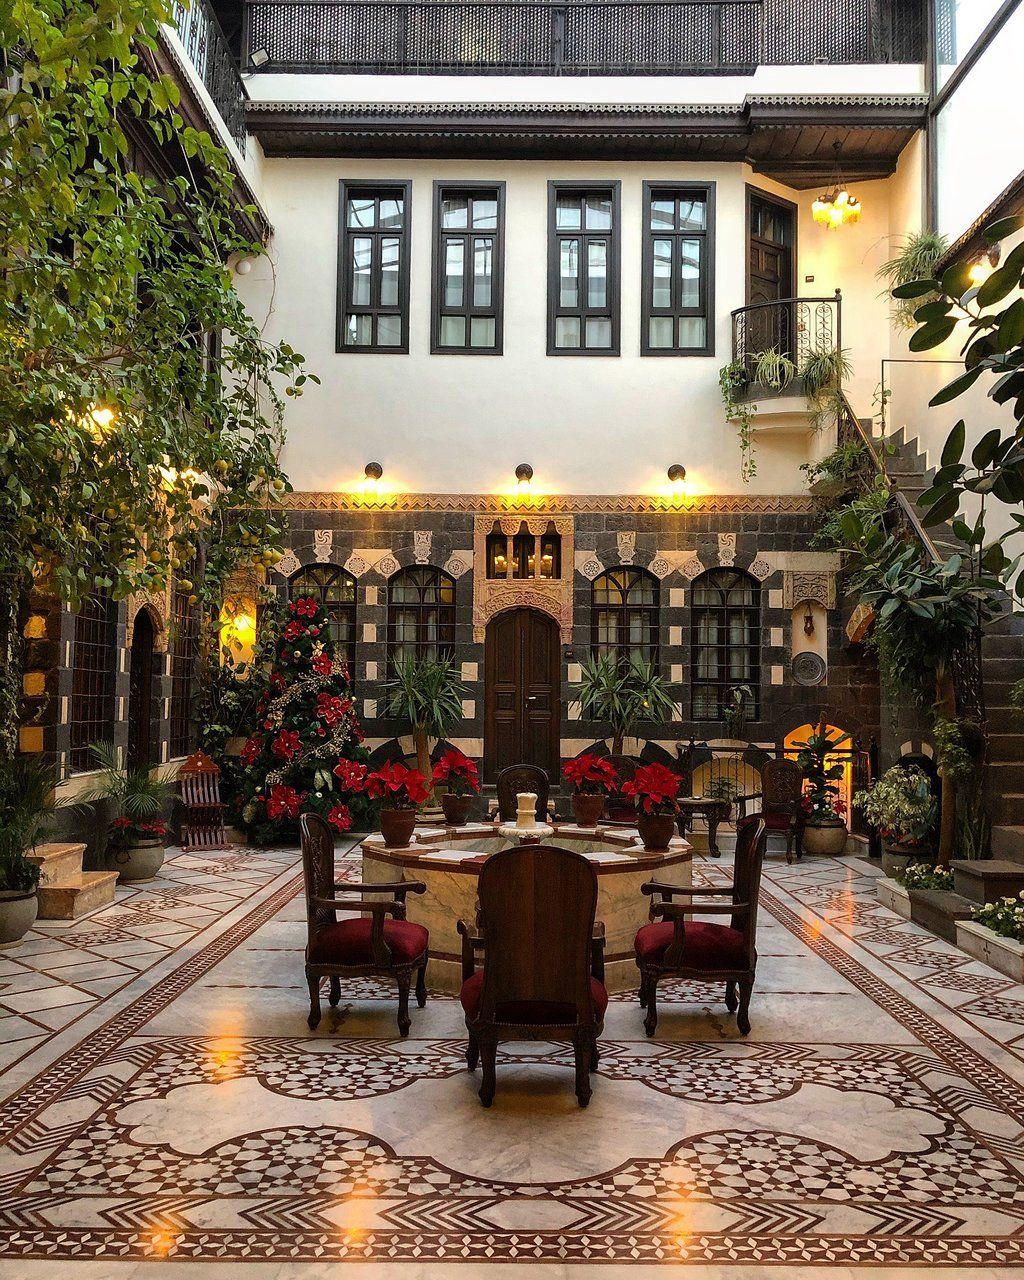 ارزانترین نرخ هتل بیت آل والی